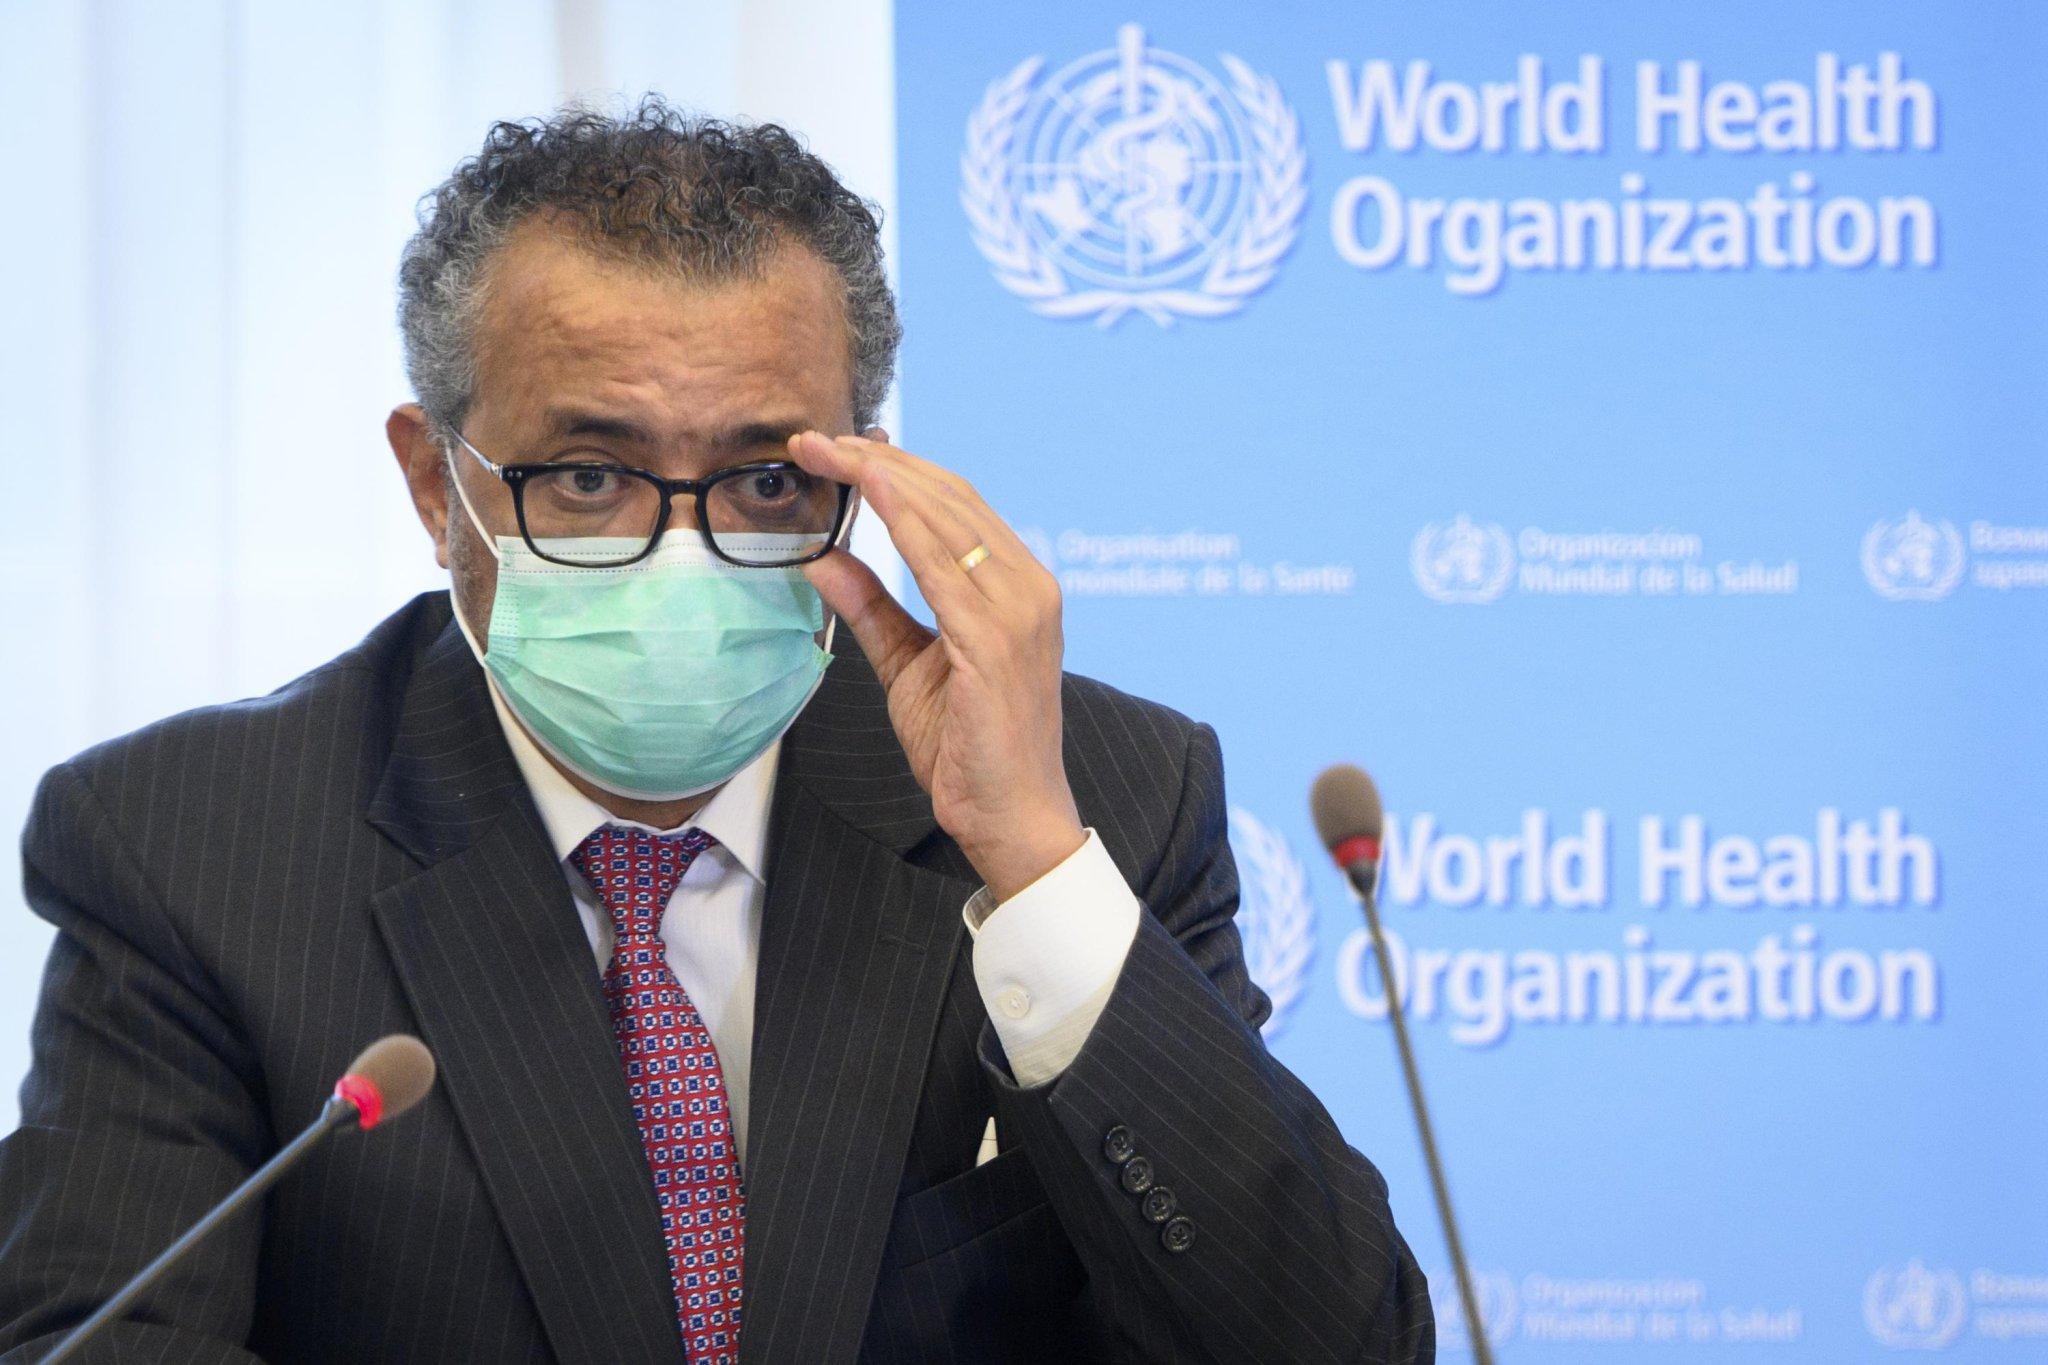 WHO leader says virus risk inevitable at Tokyo Olympics